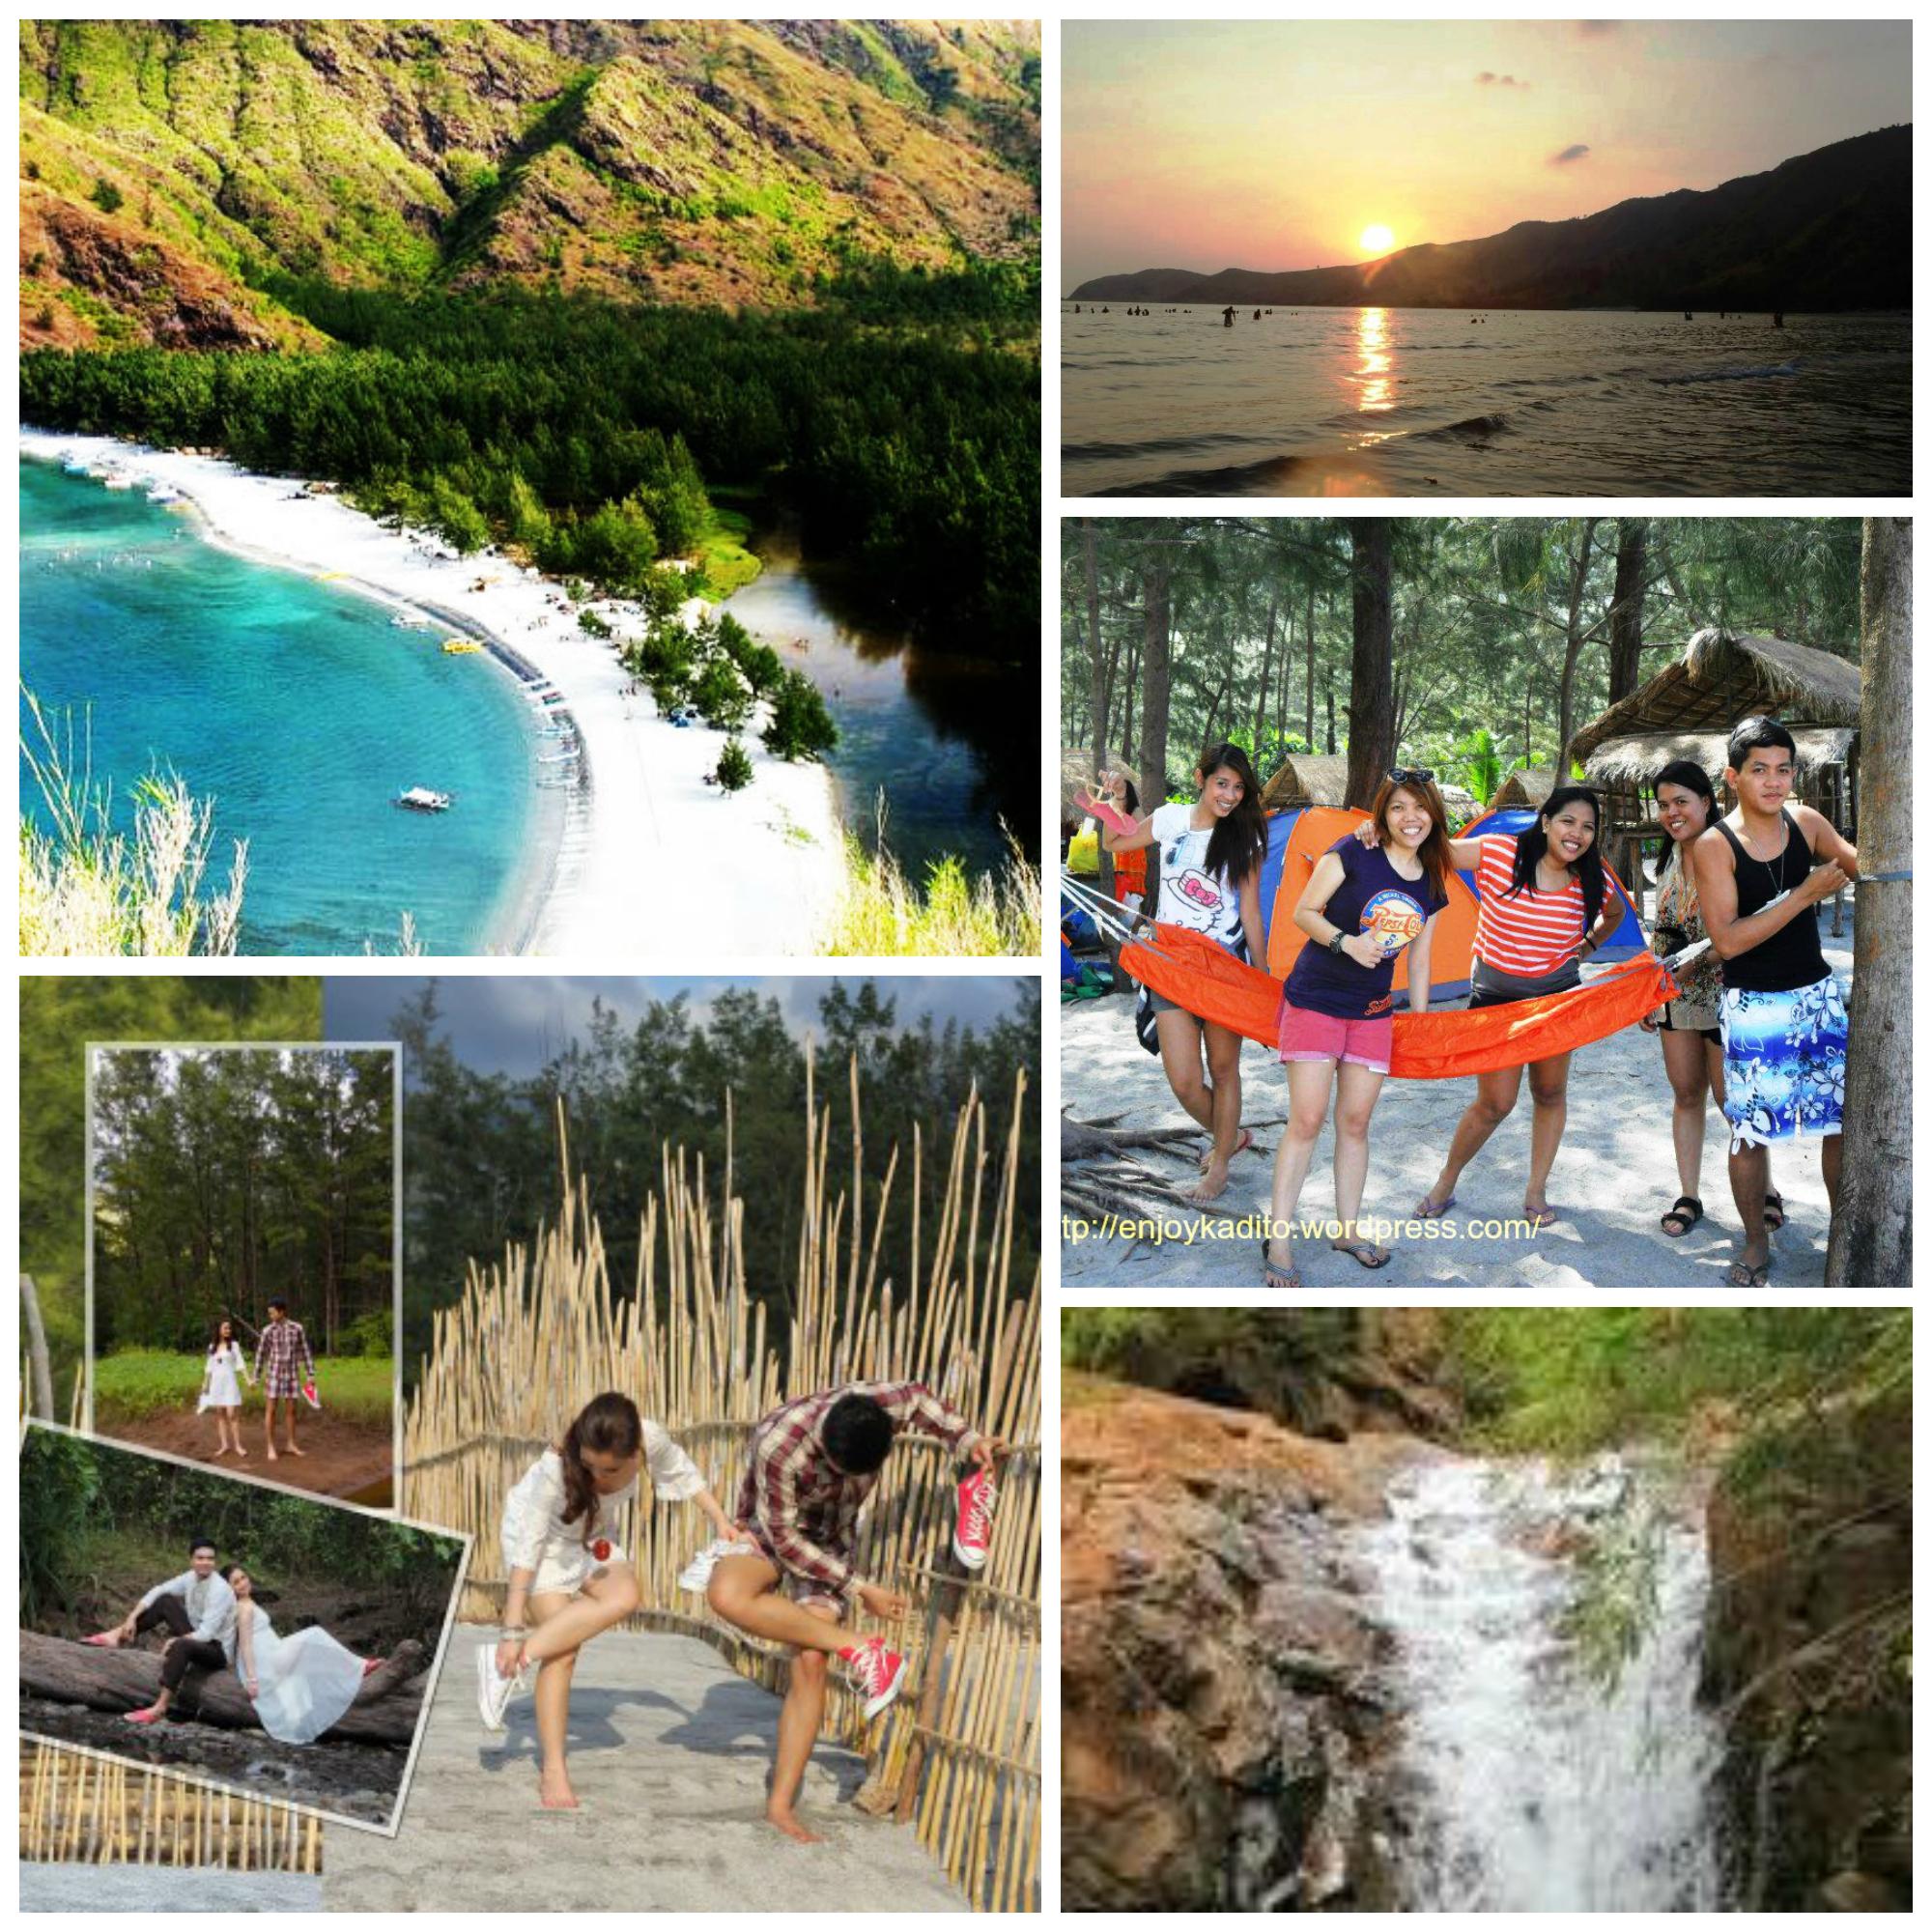 tour package enjoy ka dito anawangin nagsasa cove white sand beach and camp -collage 1.jpg